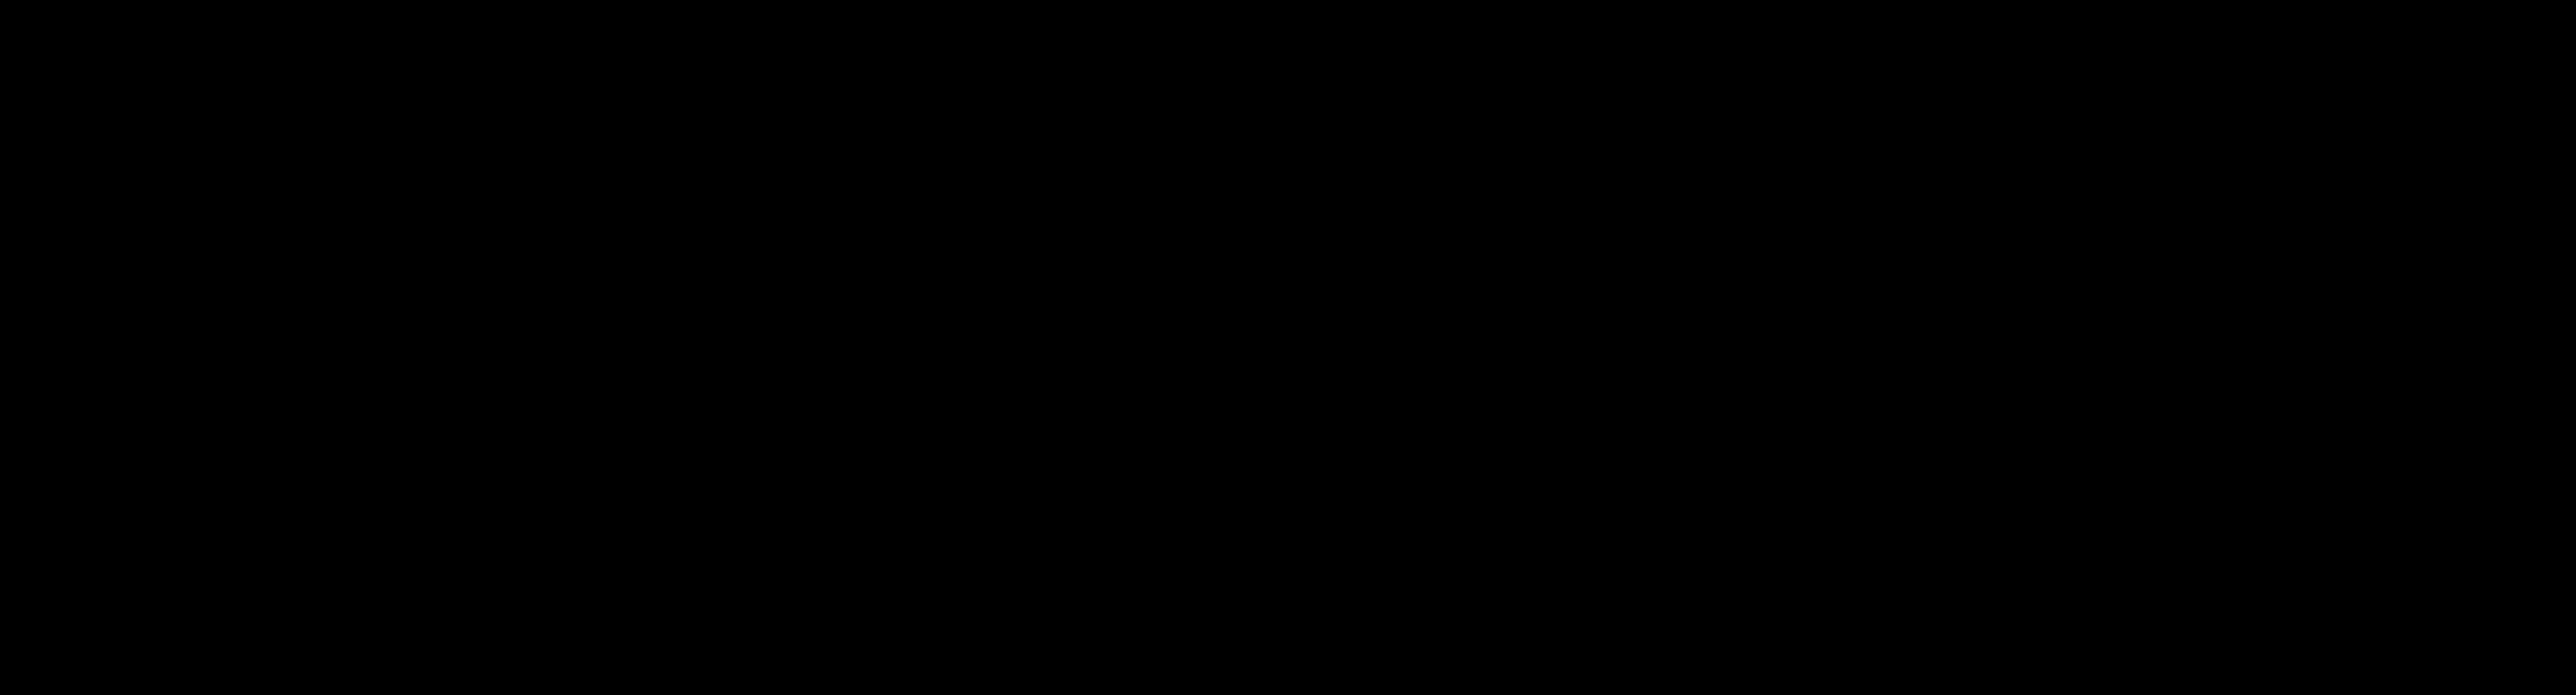 Jsatine logo fa 01